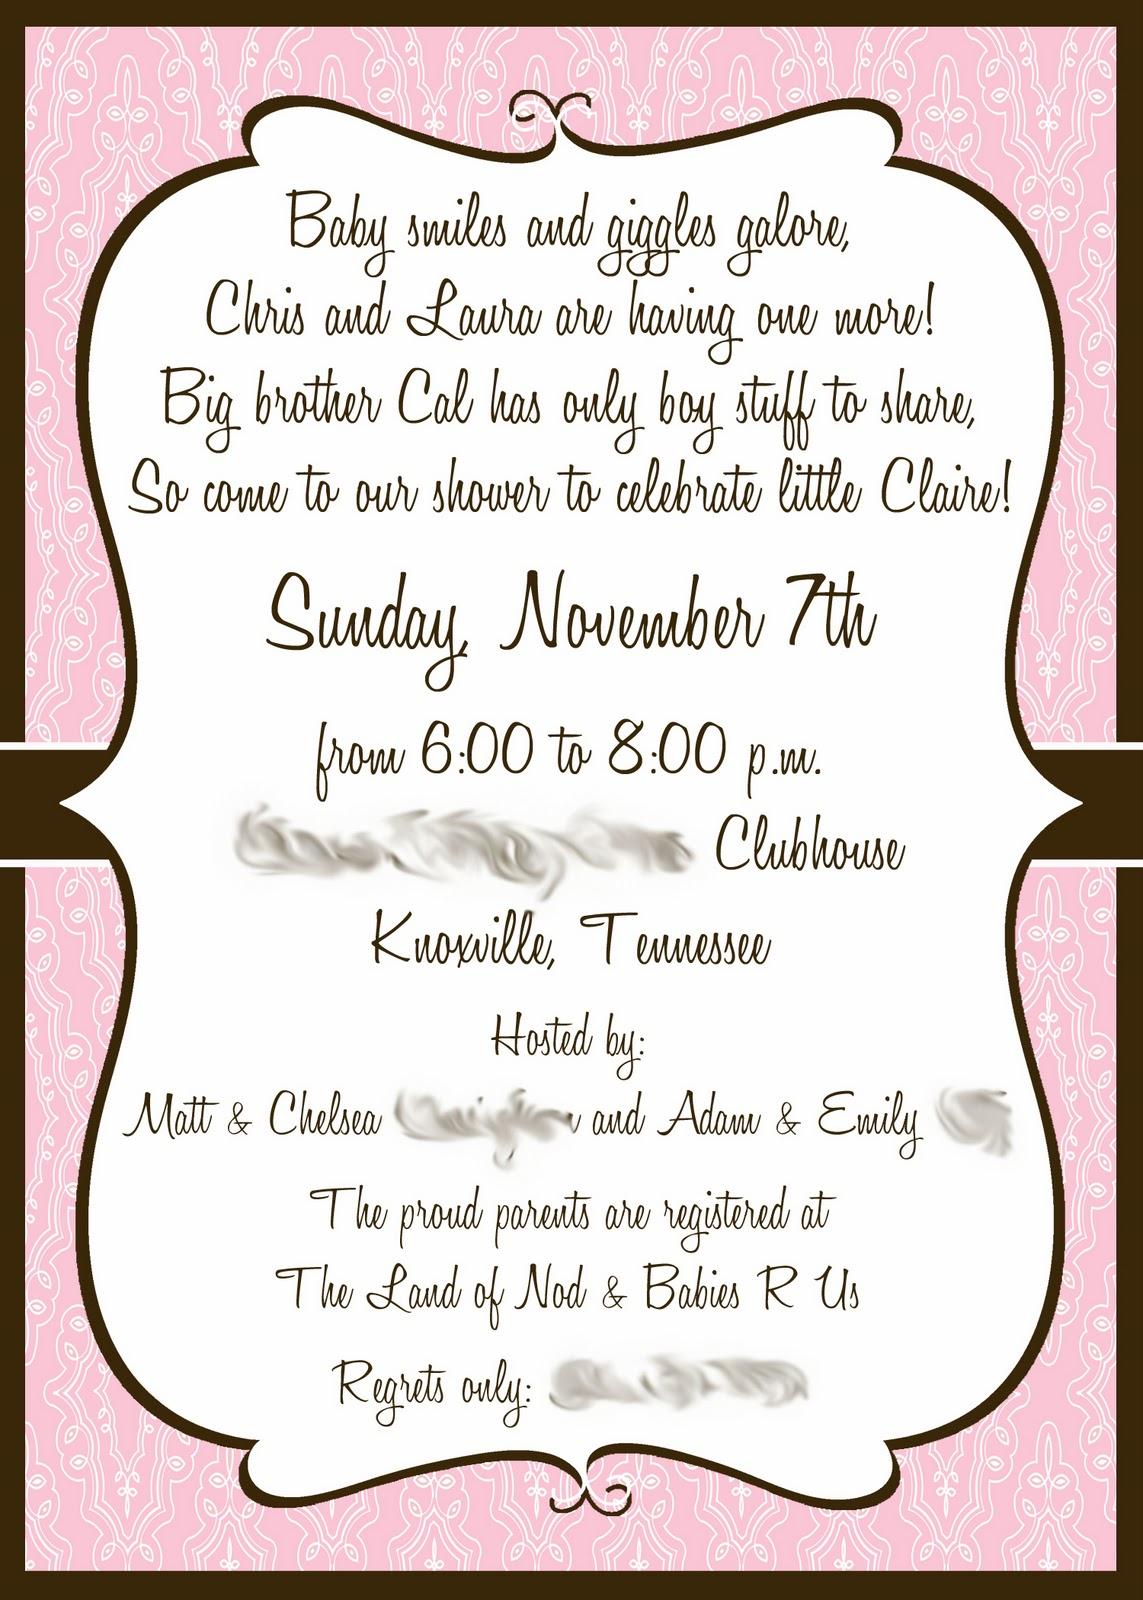 Surprise Party Invitations Wedding Plan Ideas